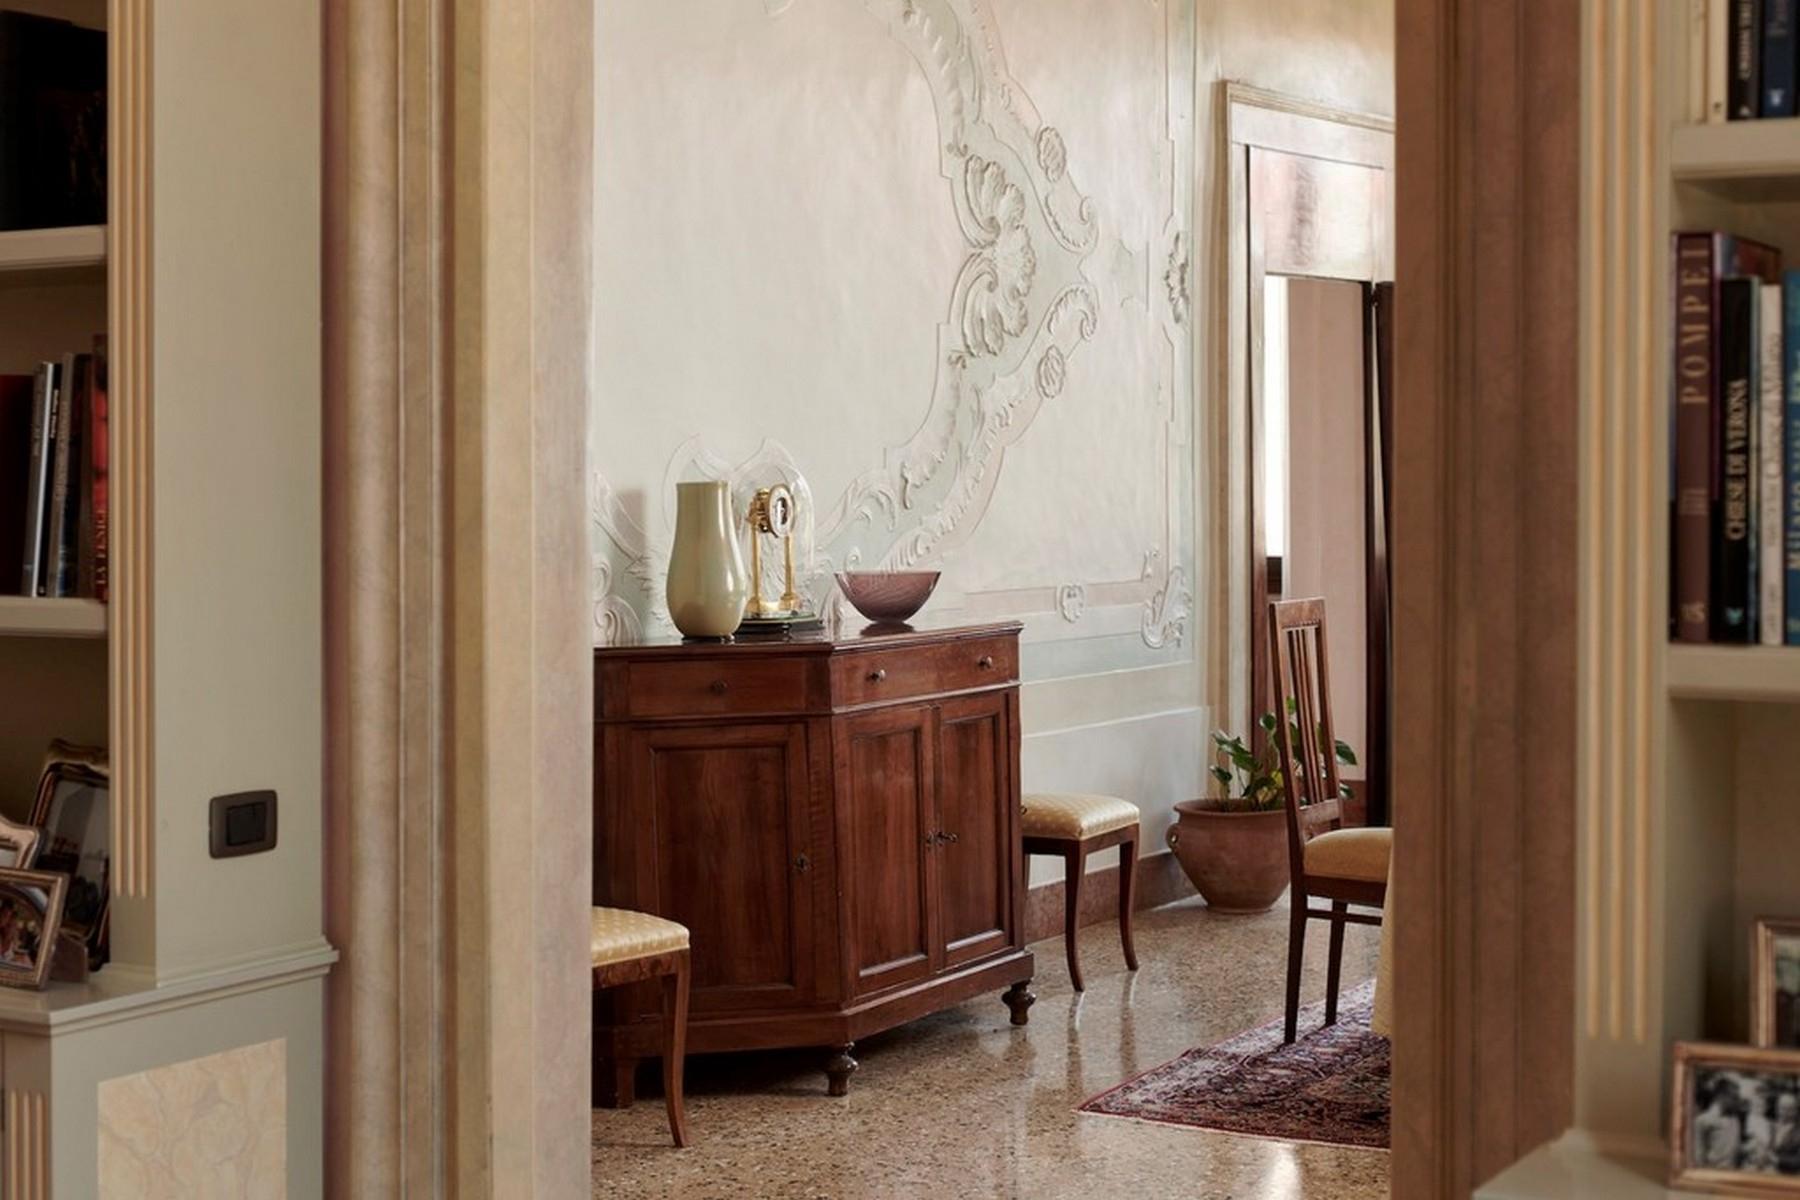 Elegante secondo Piano Nobile in un Palazzo - 6